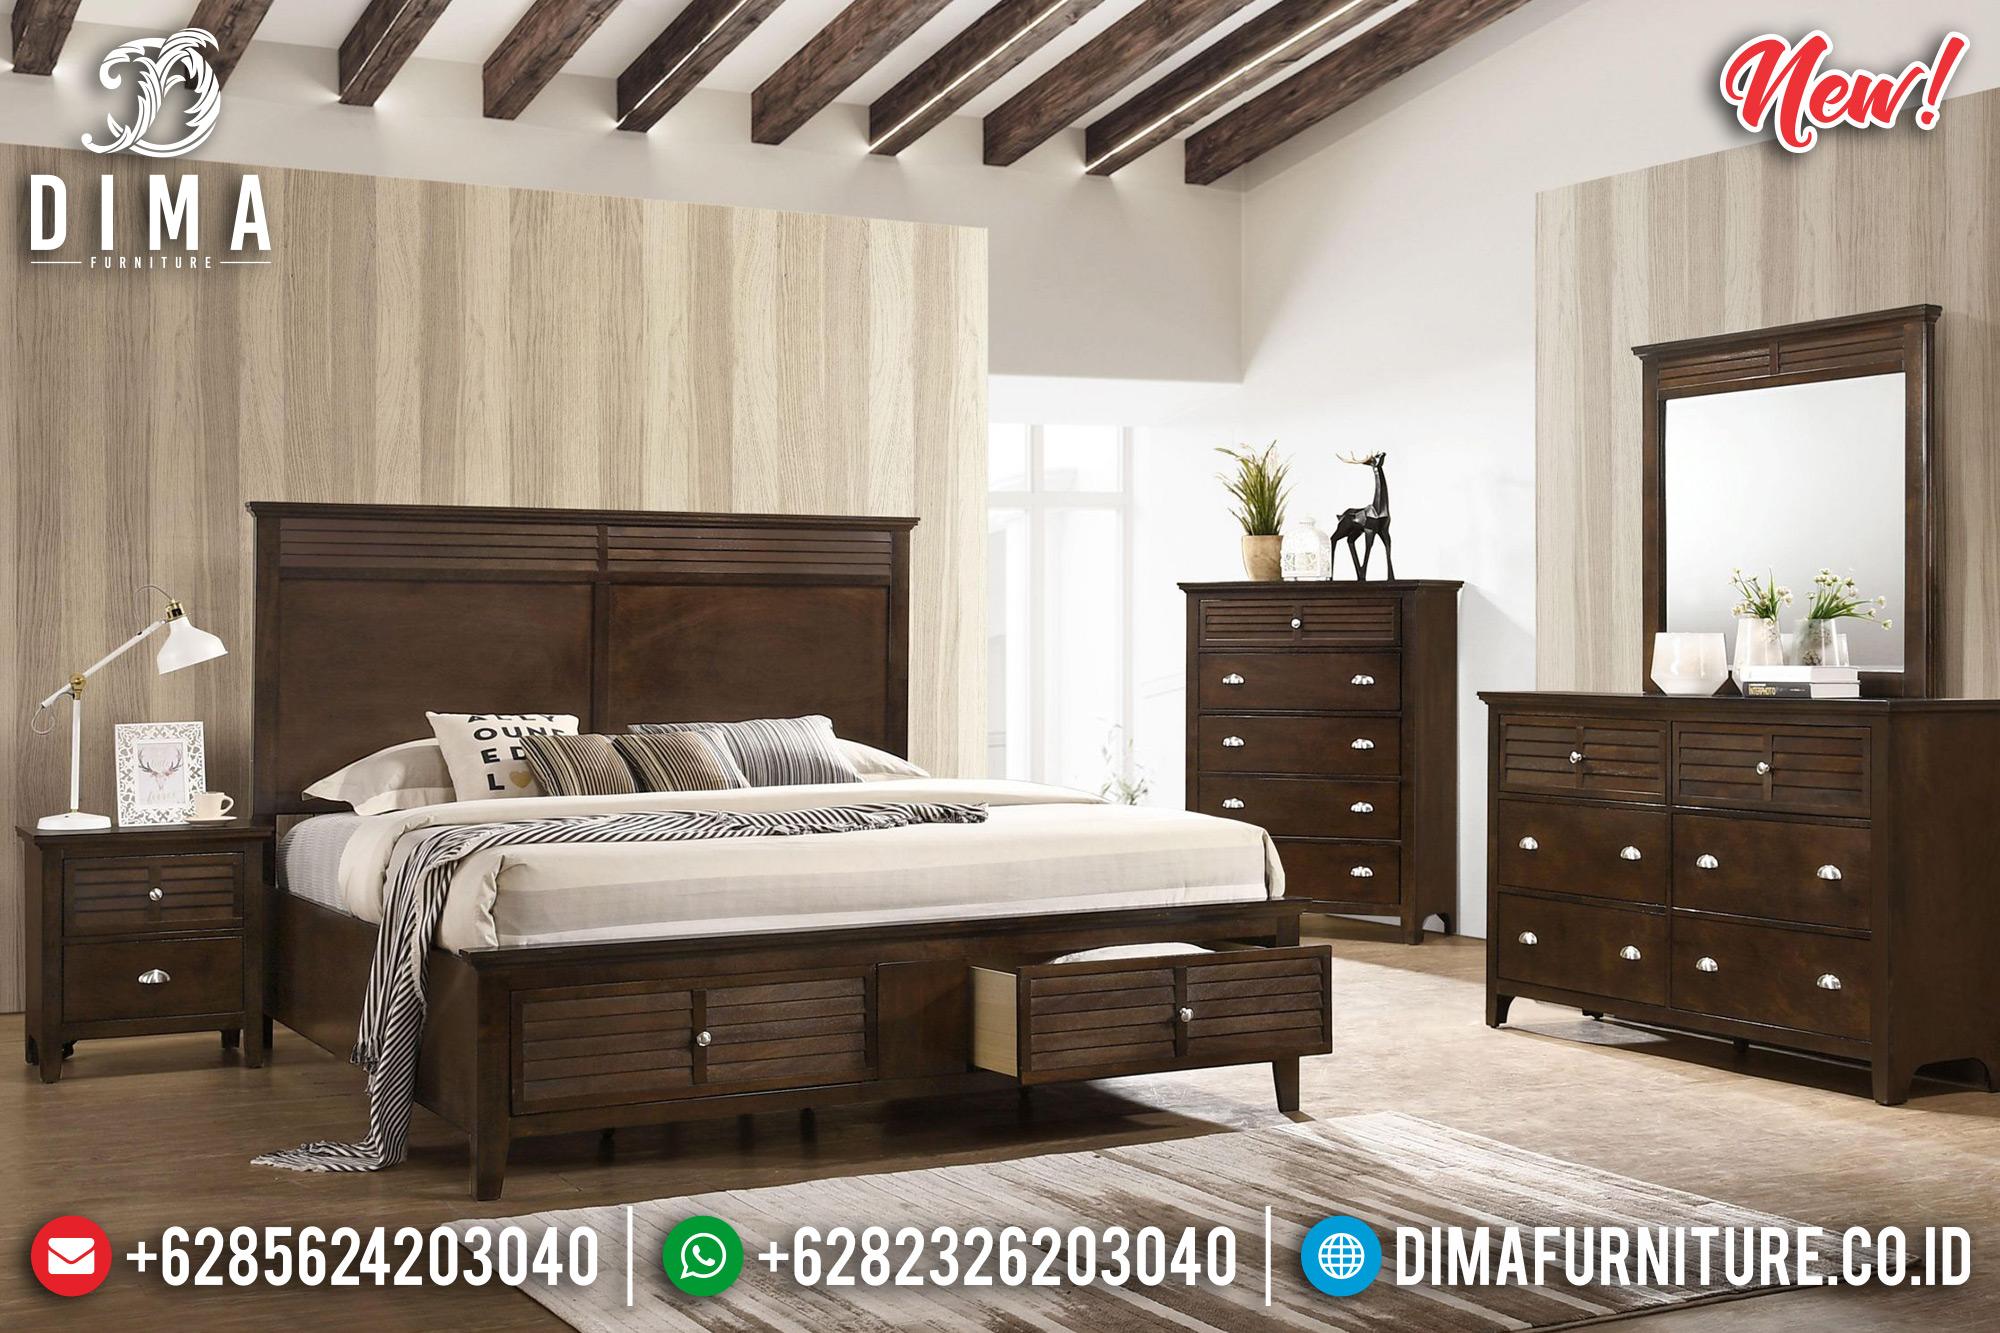 Set Tempat Tidur Minimalis Model Laci Jati Jepara DF-1017